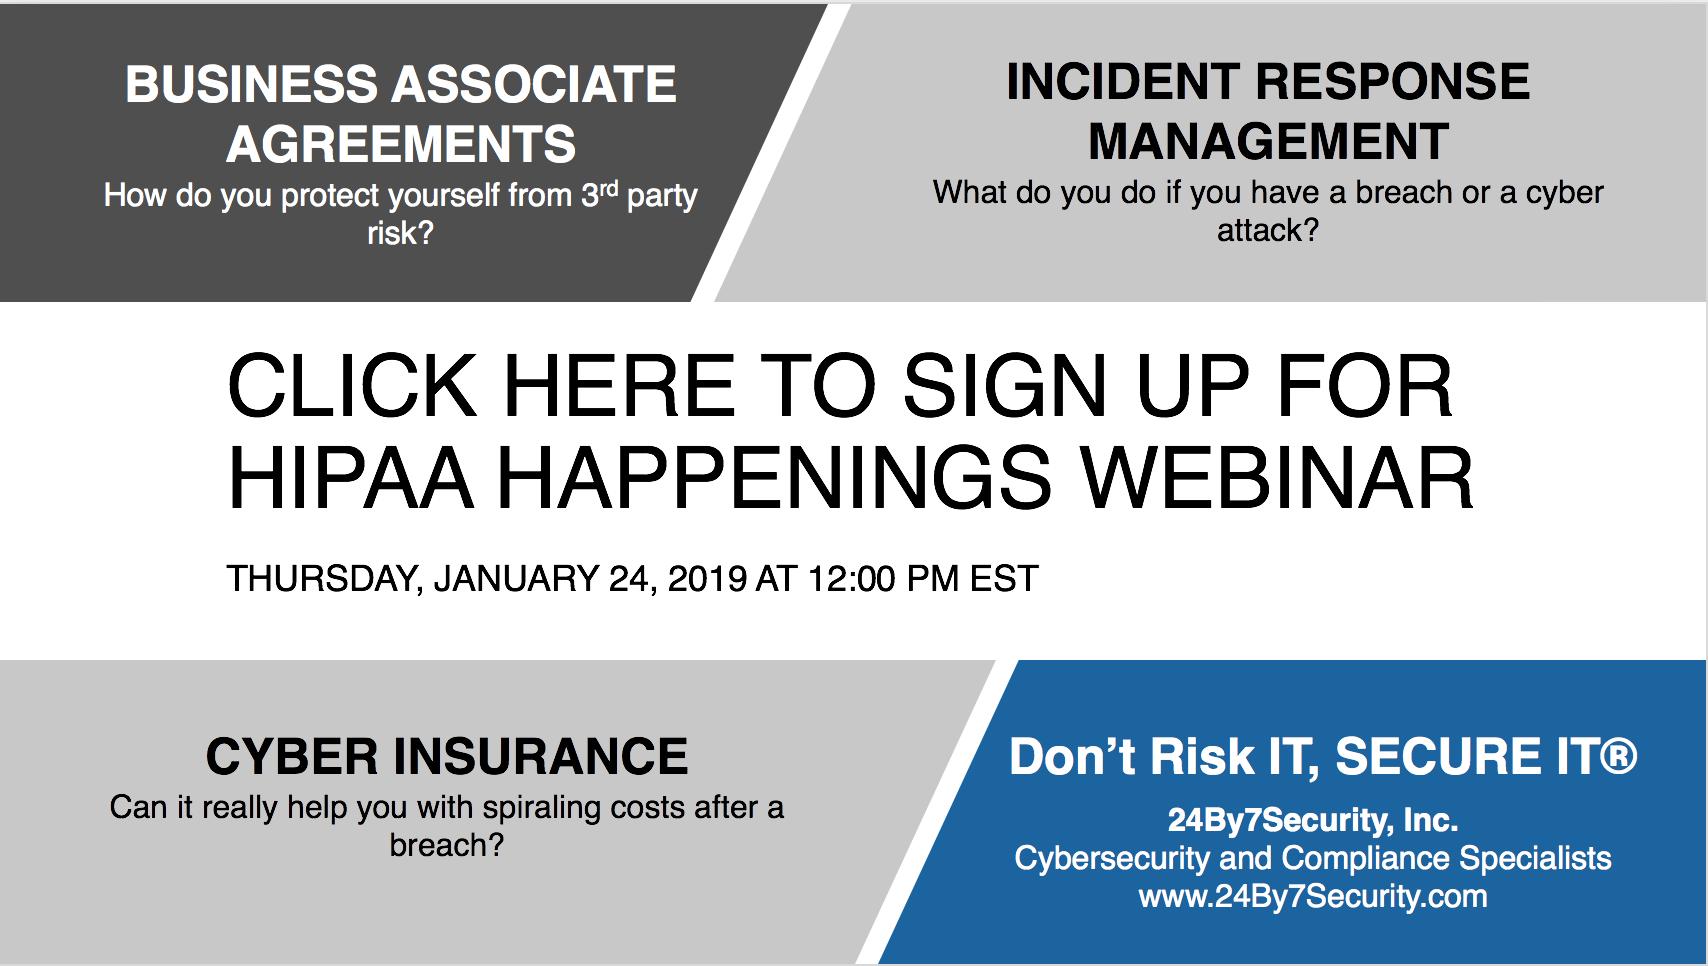 HIPAA HAPPENINGS WEBINAR JAN 24 2019-1